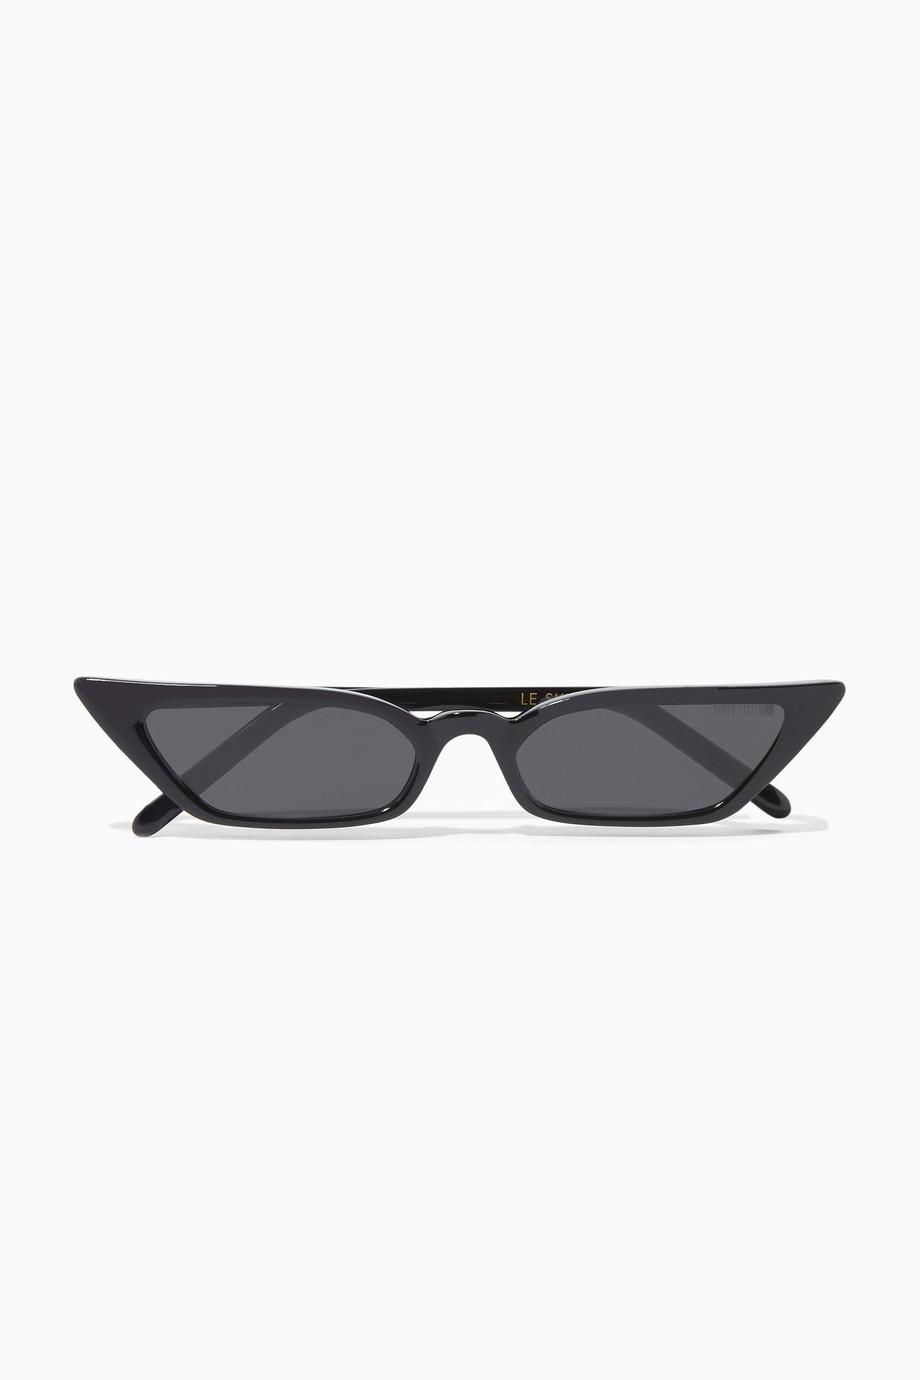 b5319c6a60 Shop Poppy Lissiman Black Black Le Skinny Sunglasses for Women ...